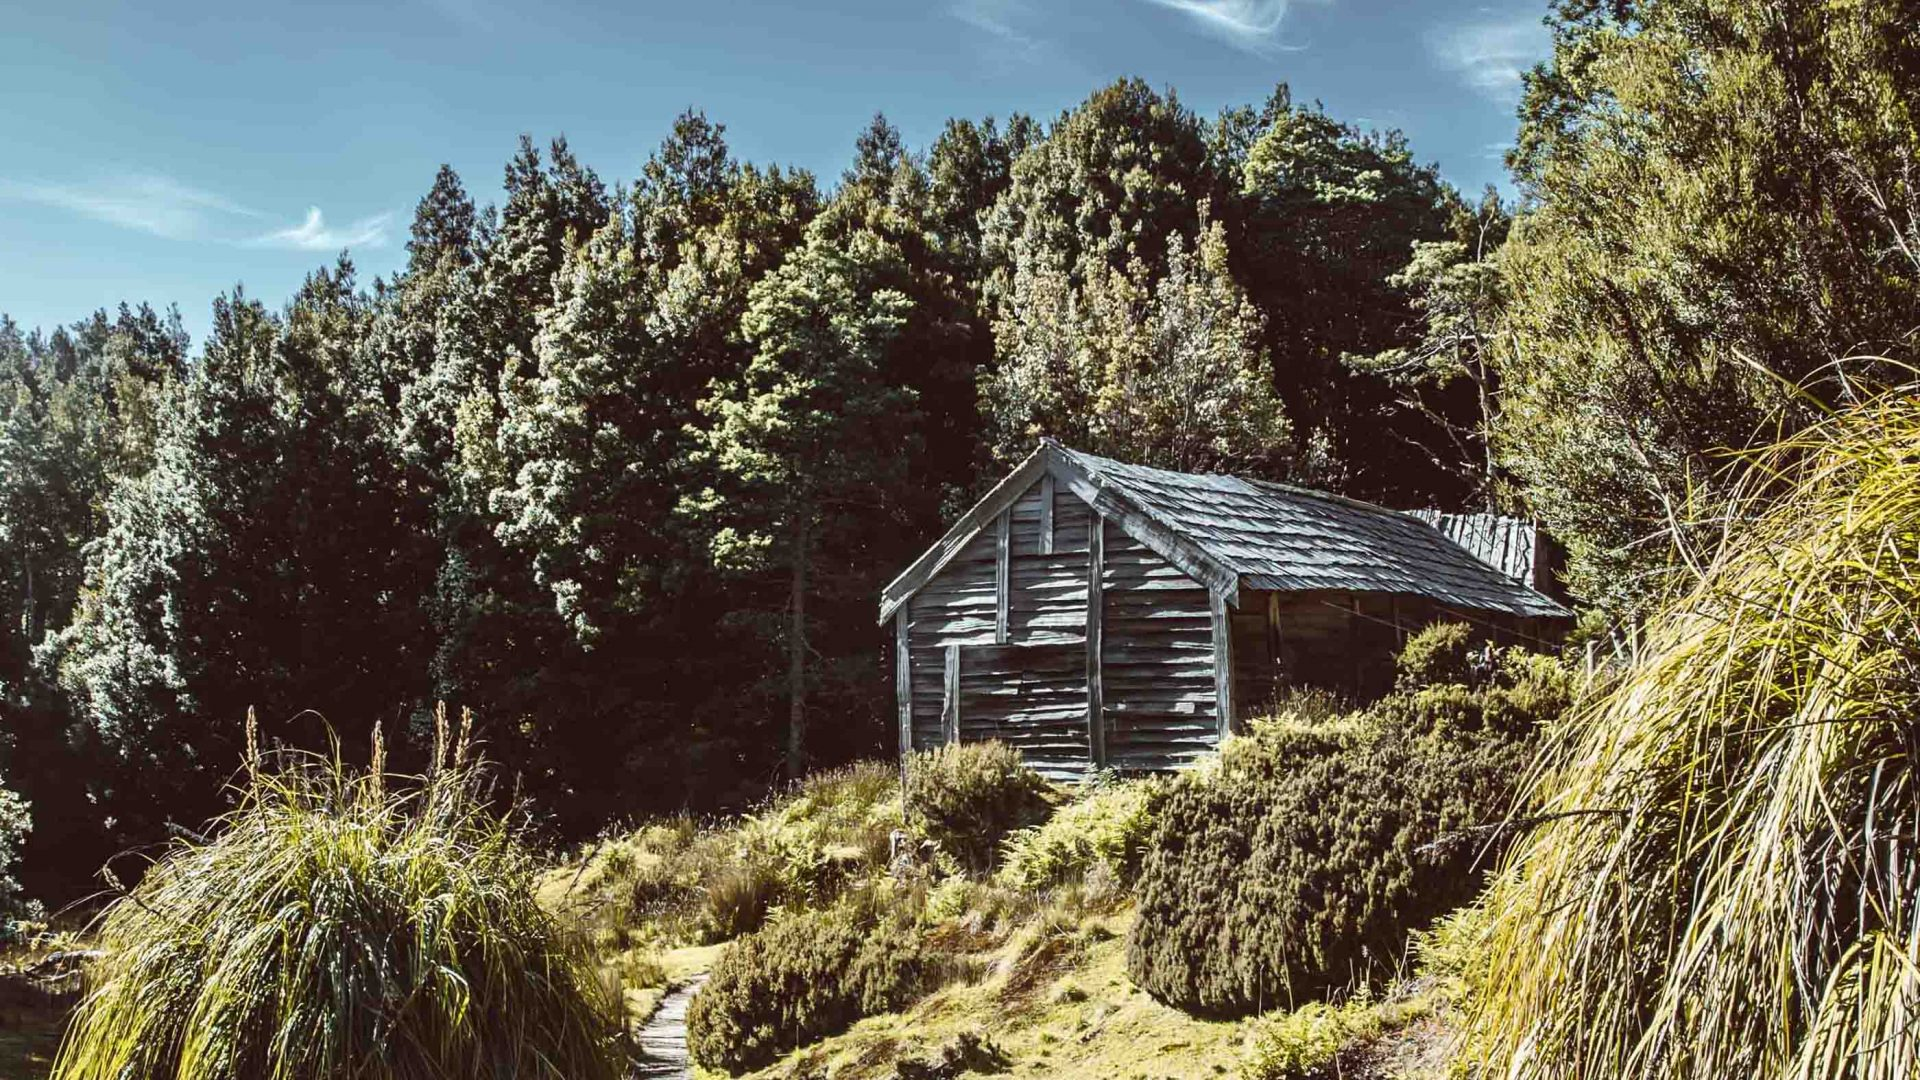 A wooden hut sits amongst trees.